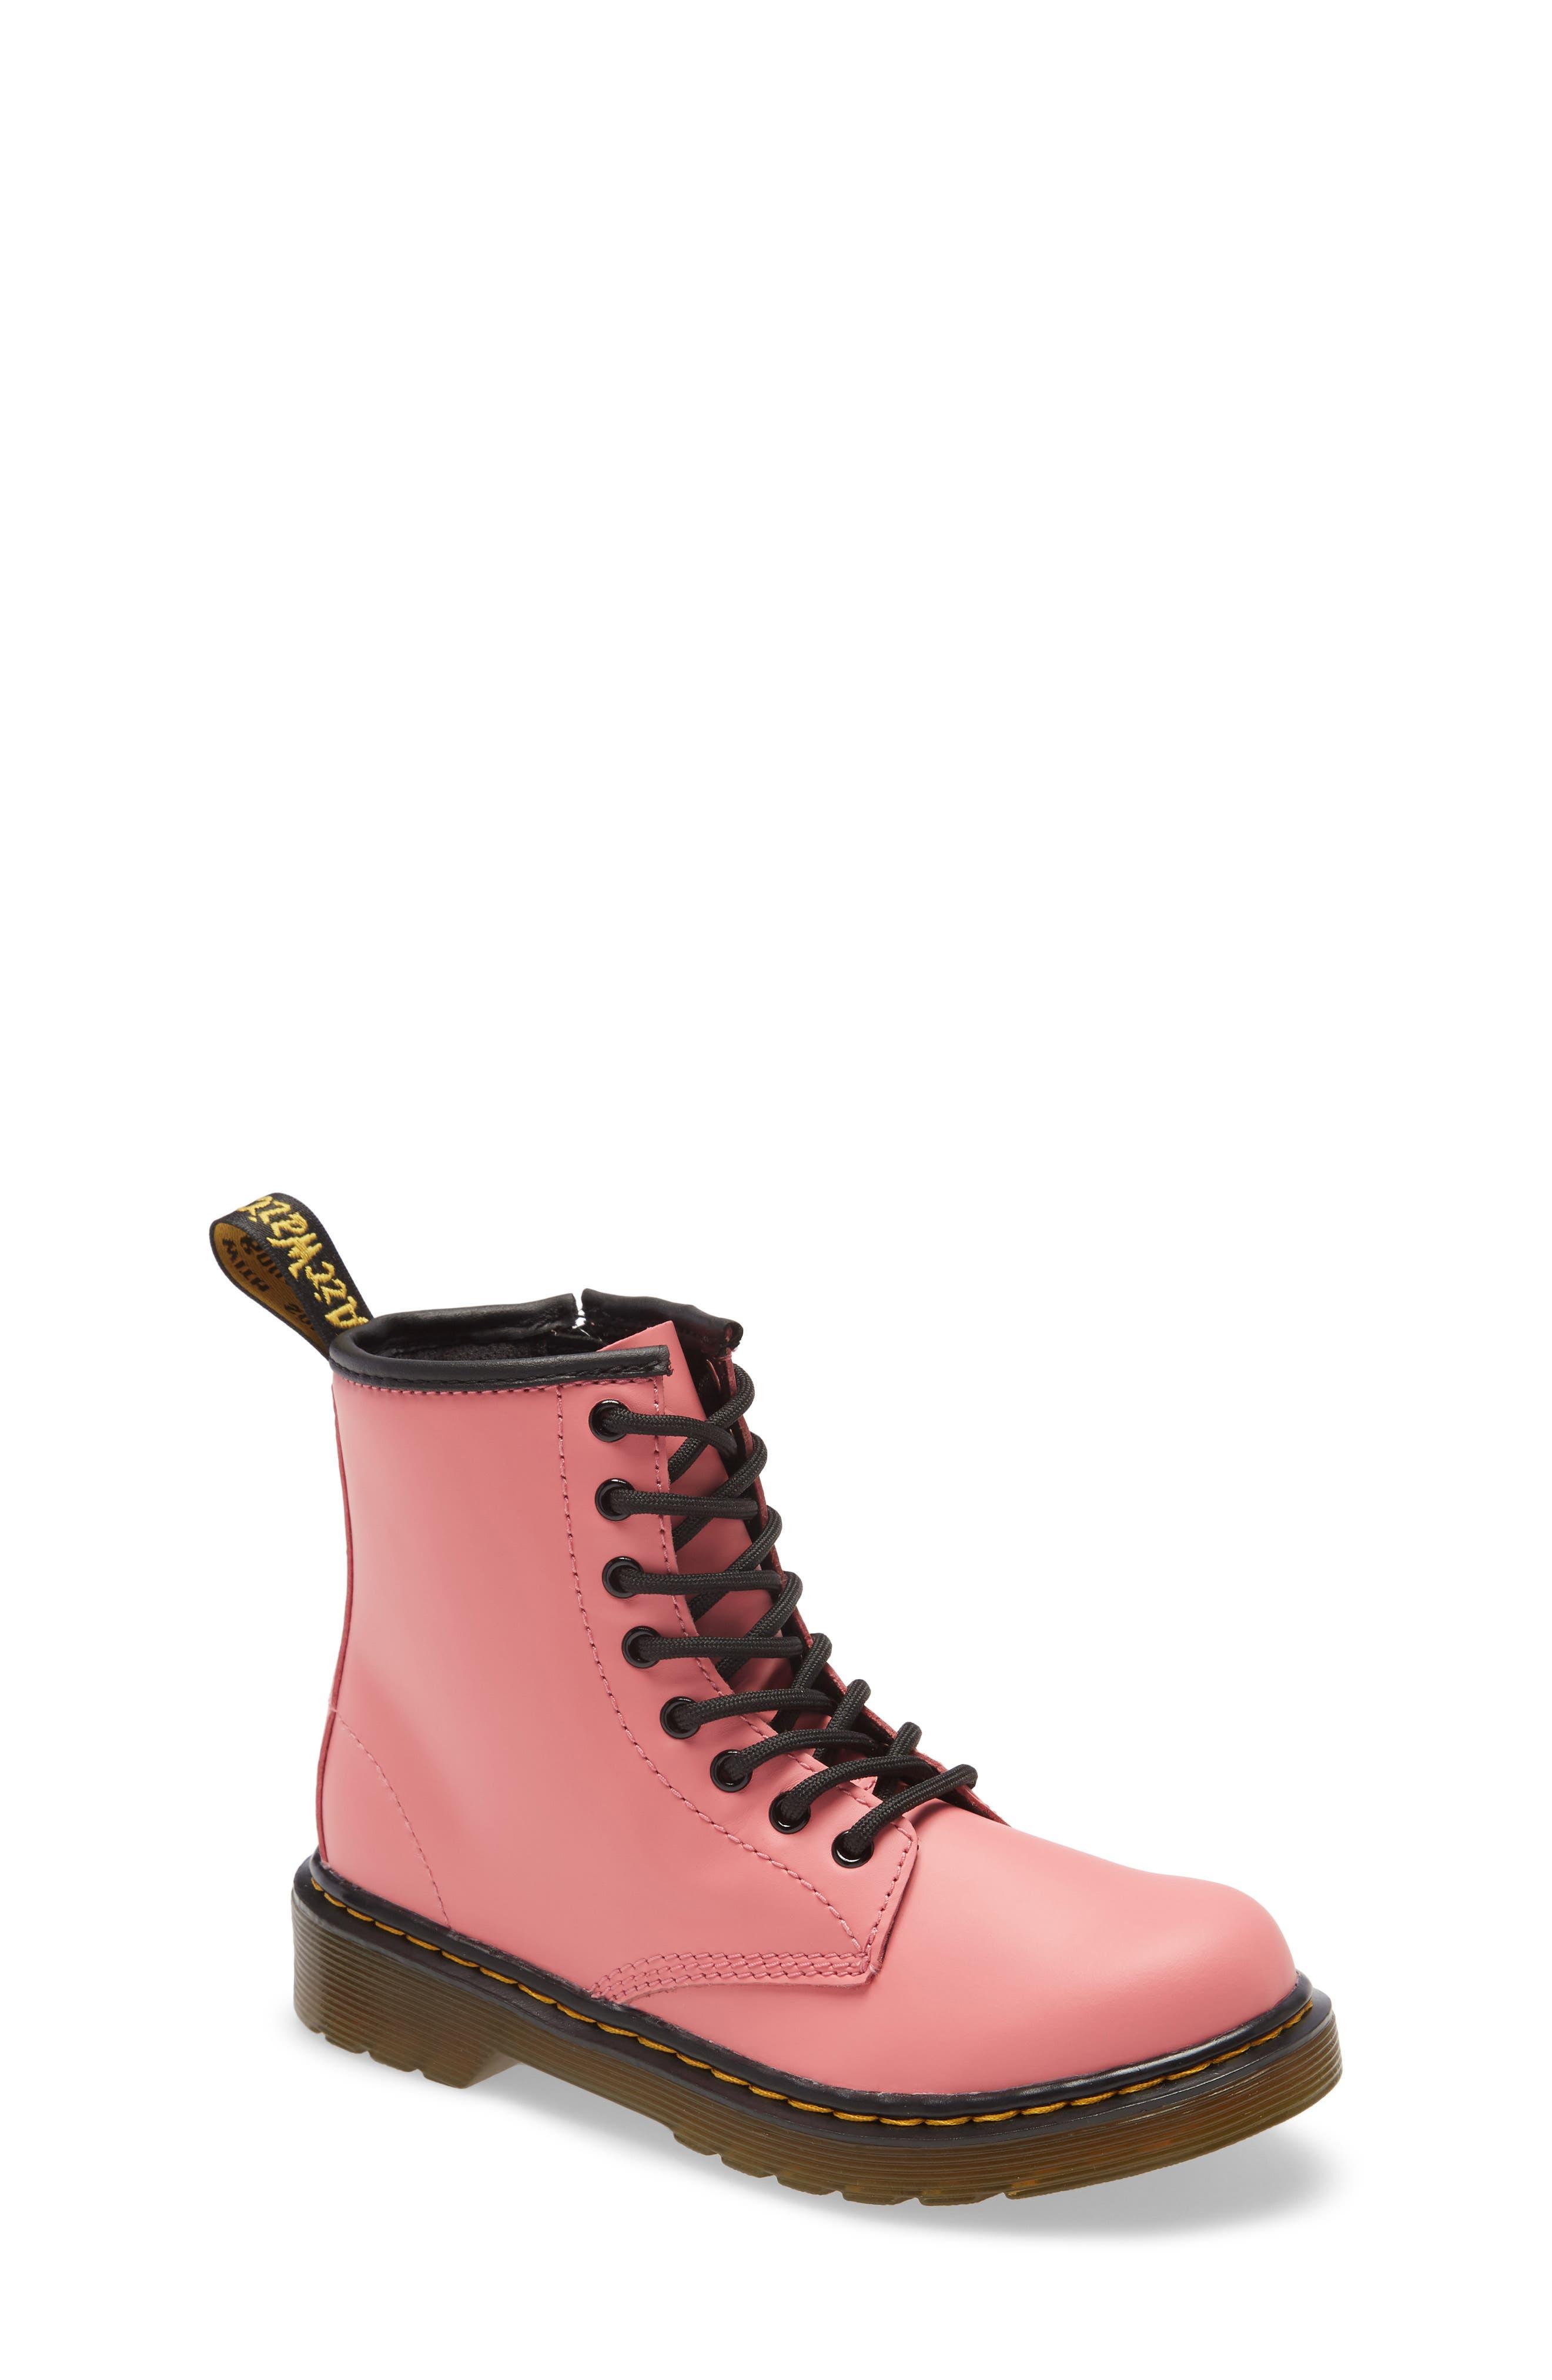 Big Girls' Dr. Martens Shoes (Sizes 3.5-7)